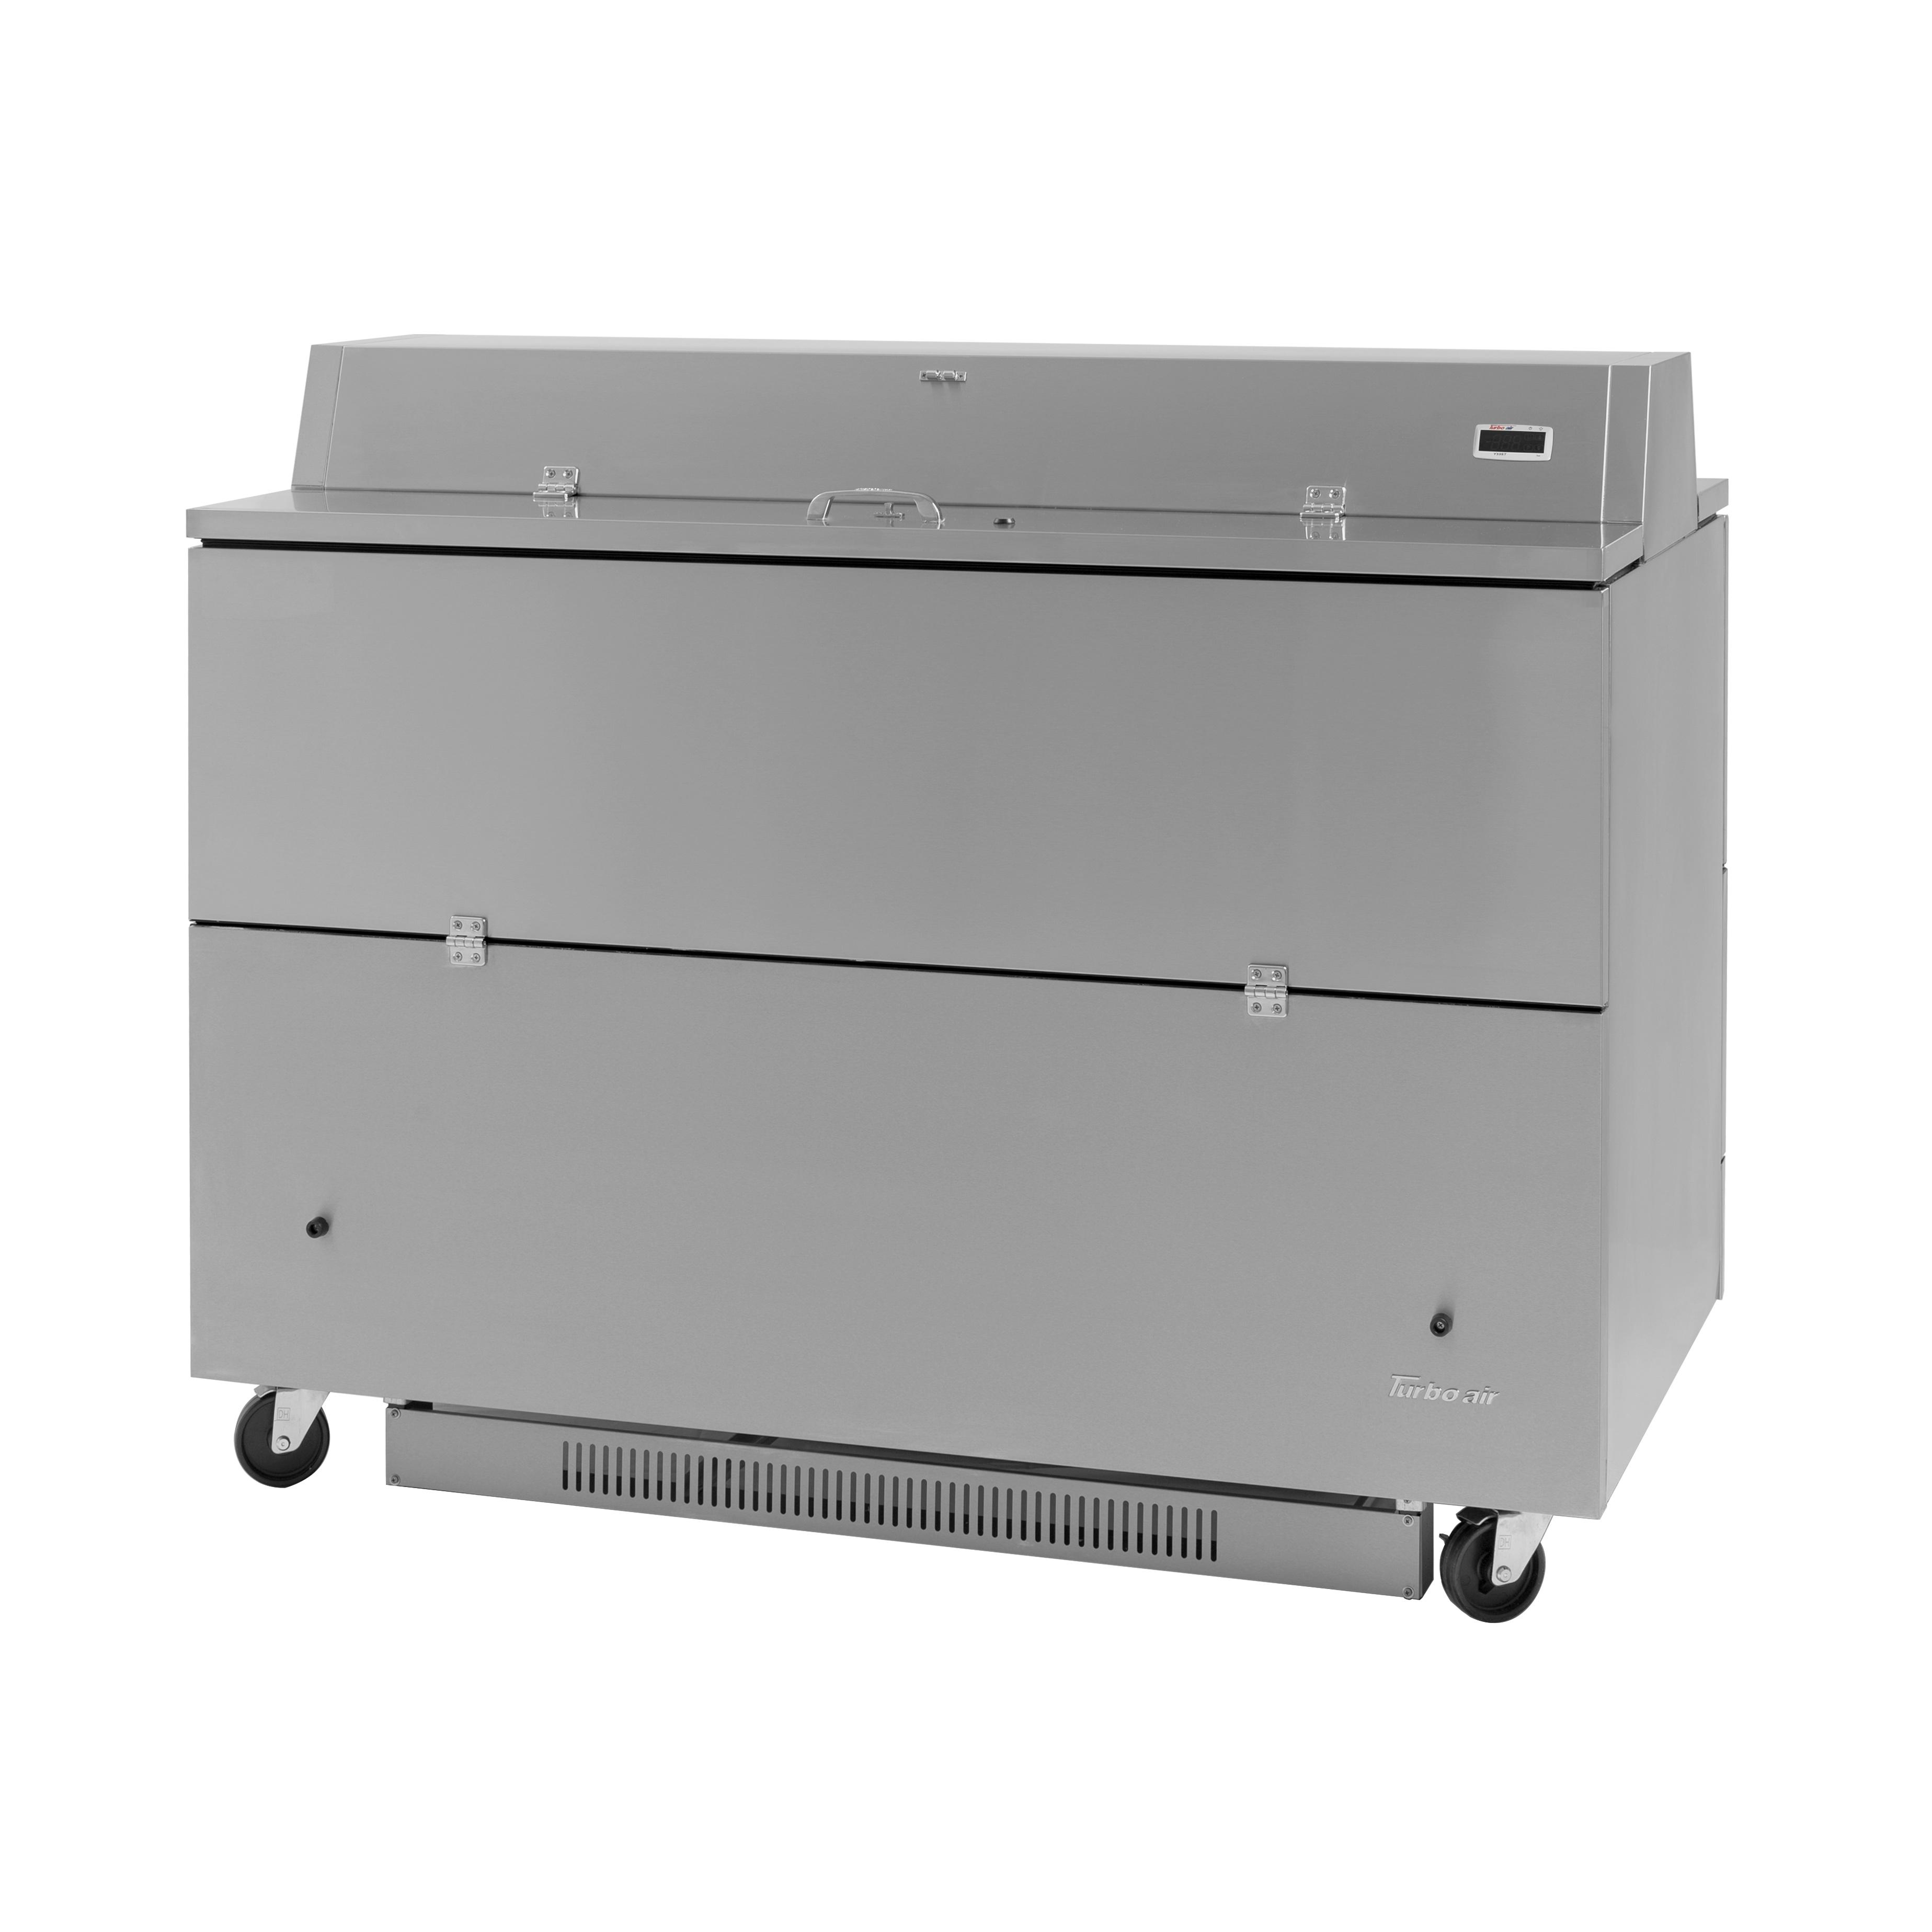 Turbo Air TMKC-58D-SS milk cooler / station